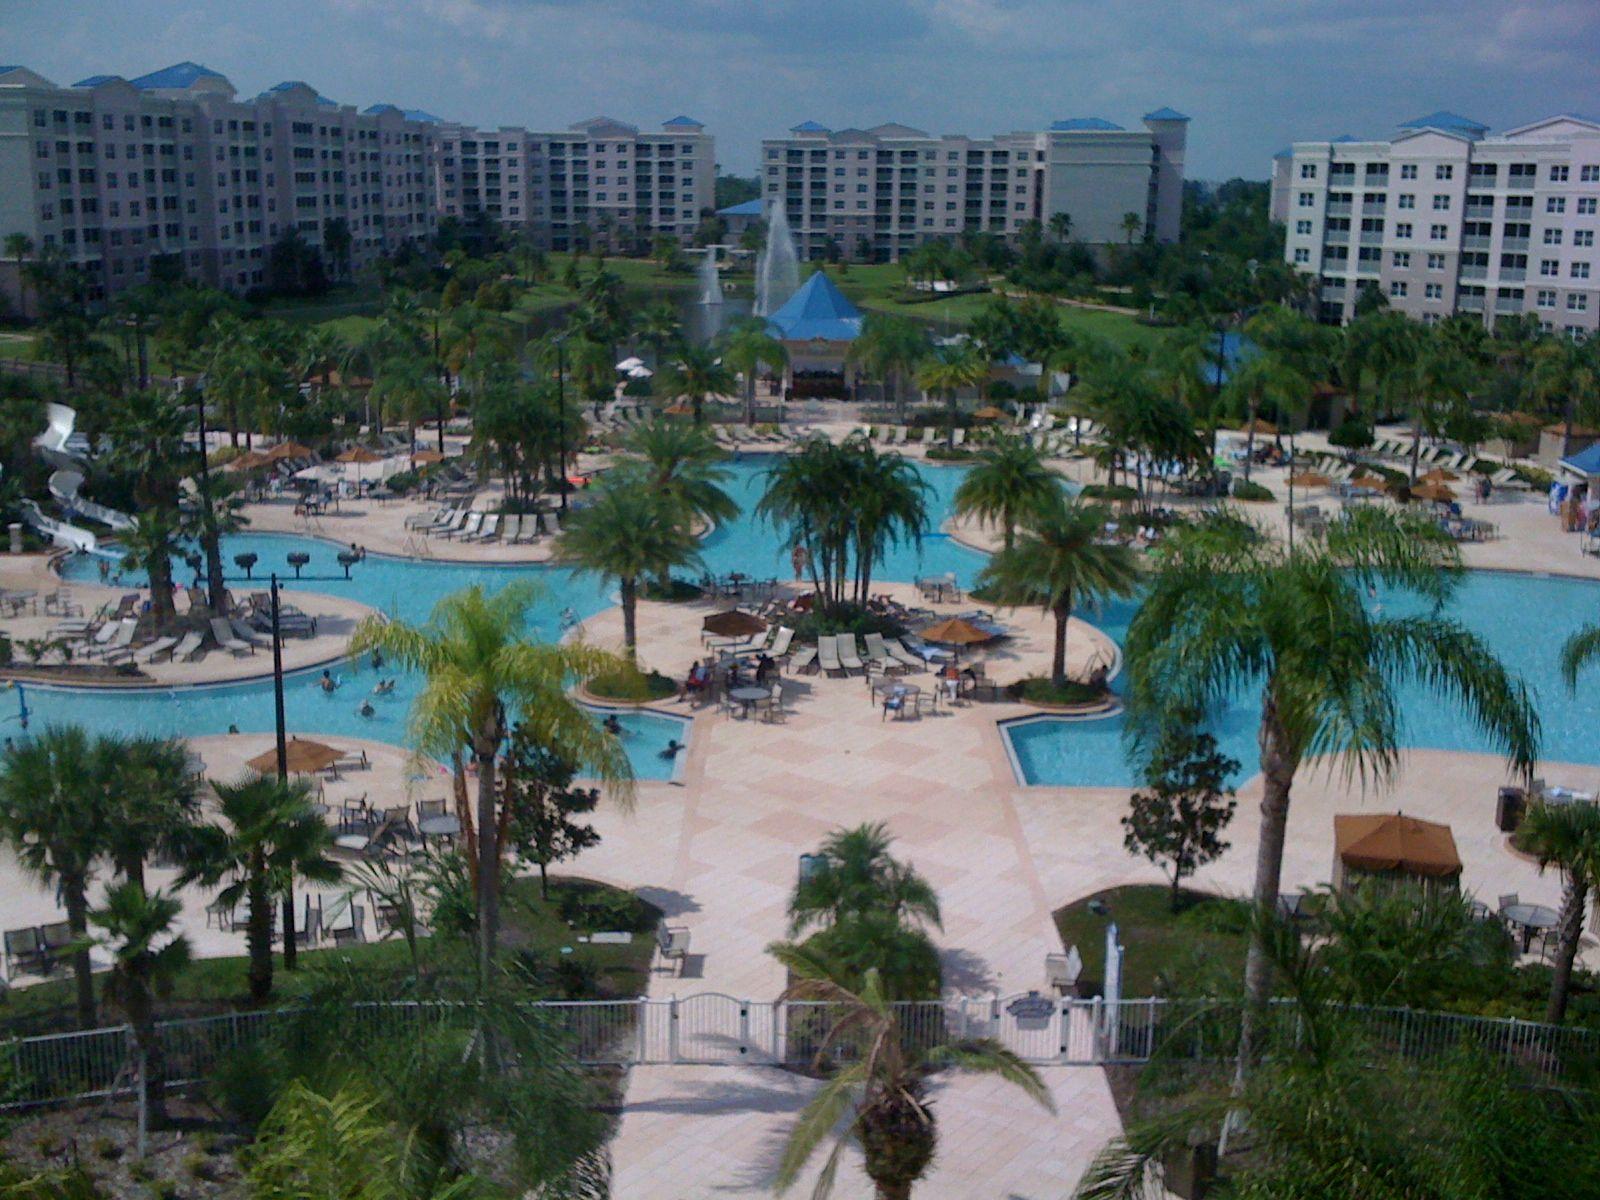 BlueGreen Resort at Orlando FL  Bluegreen resorts